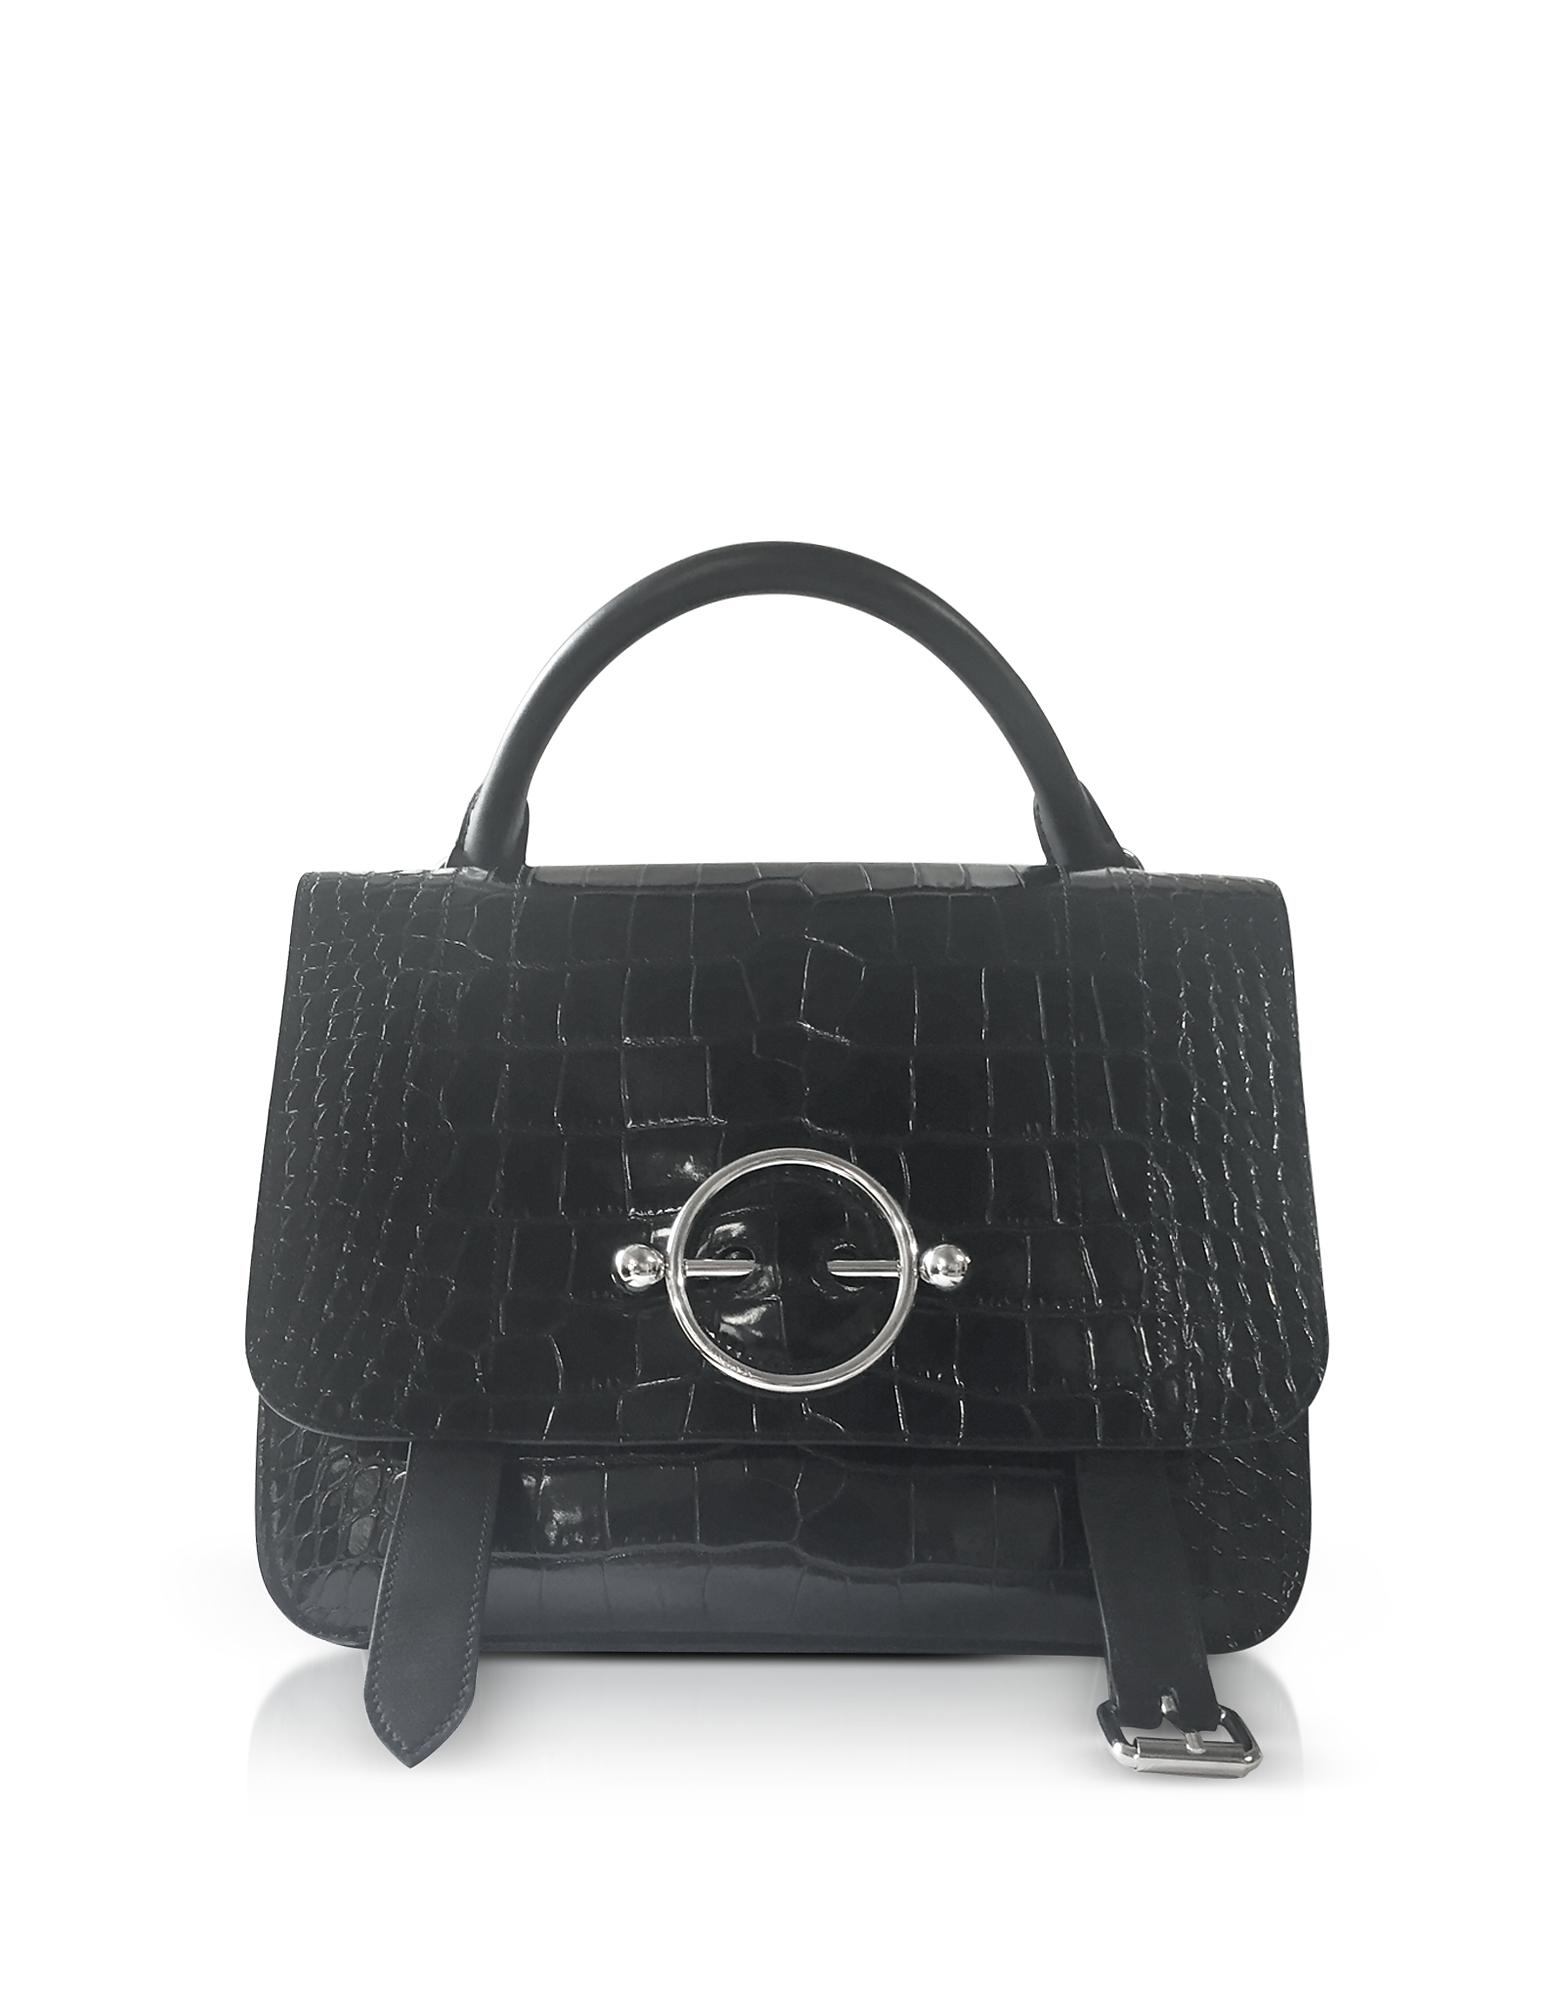 Black Croco Embossed Leather Disc Satchel Bag